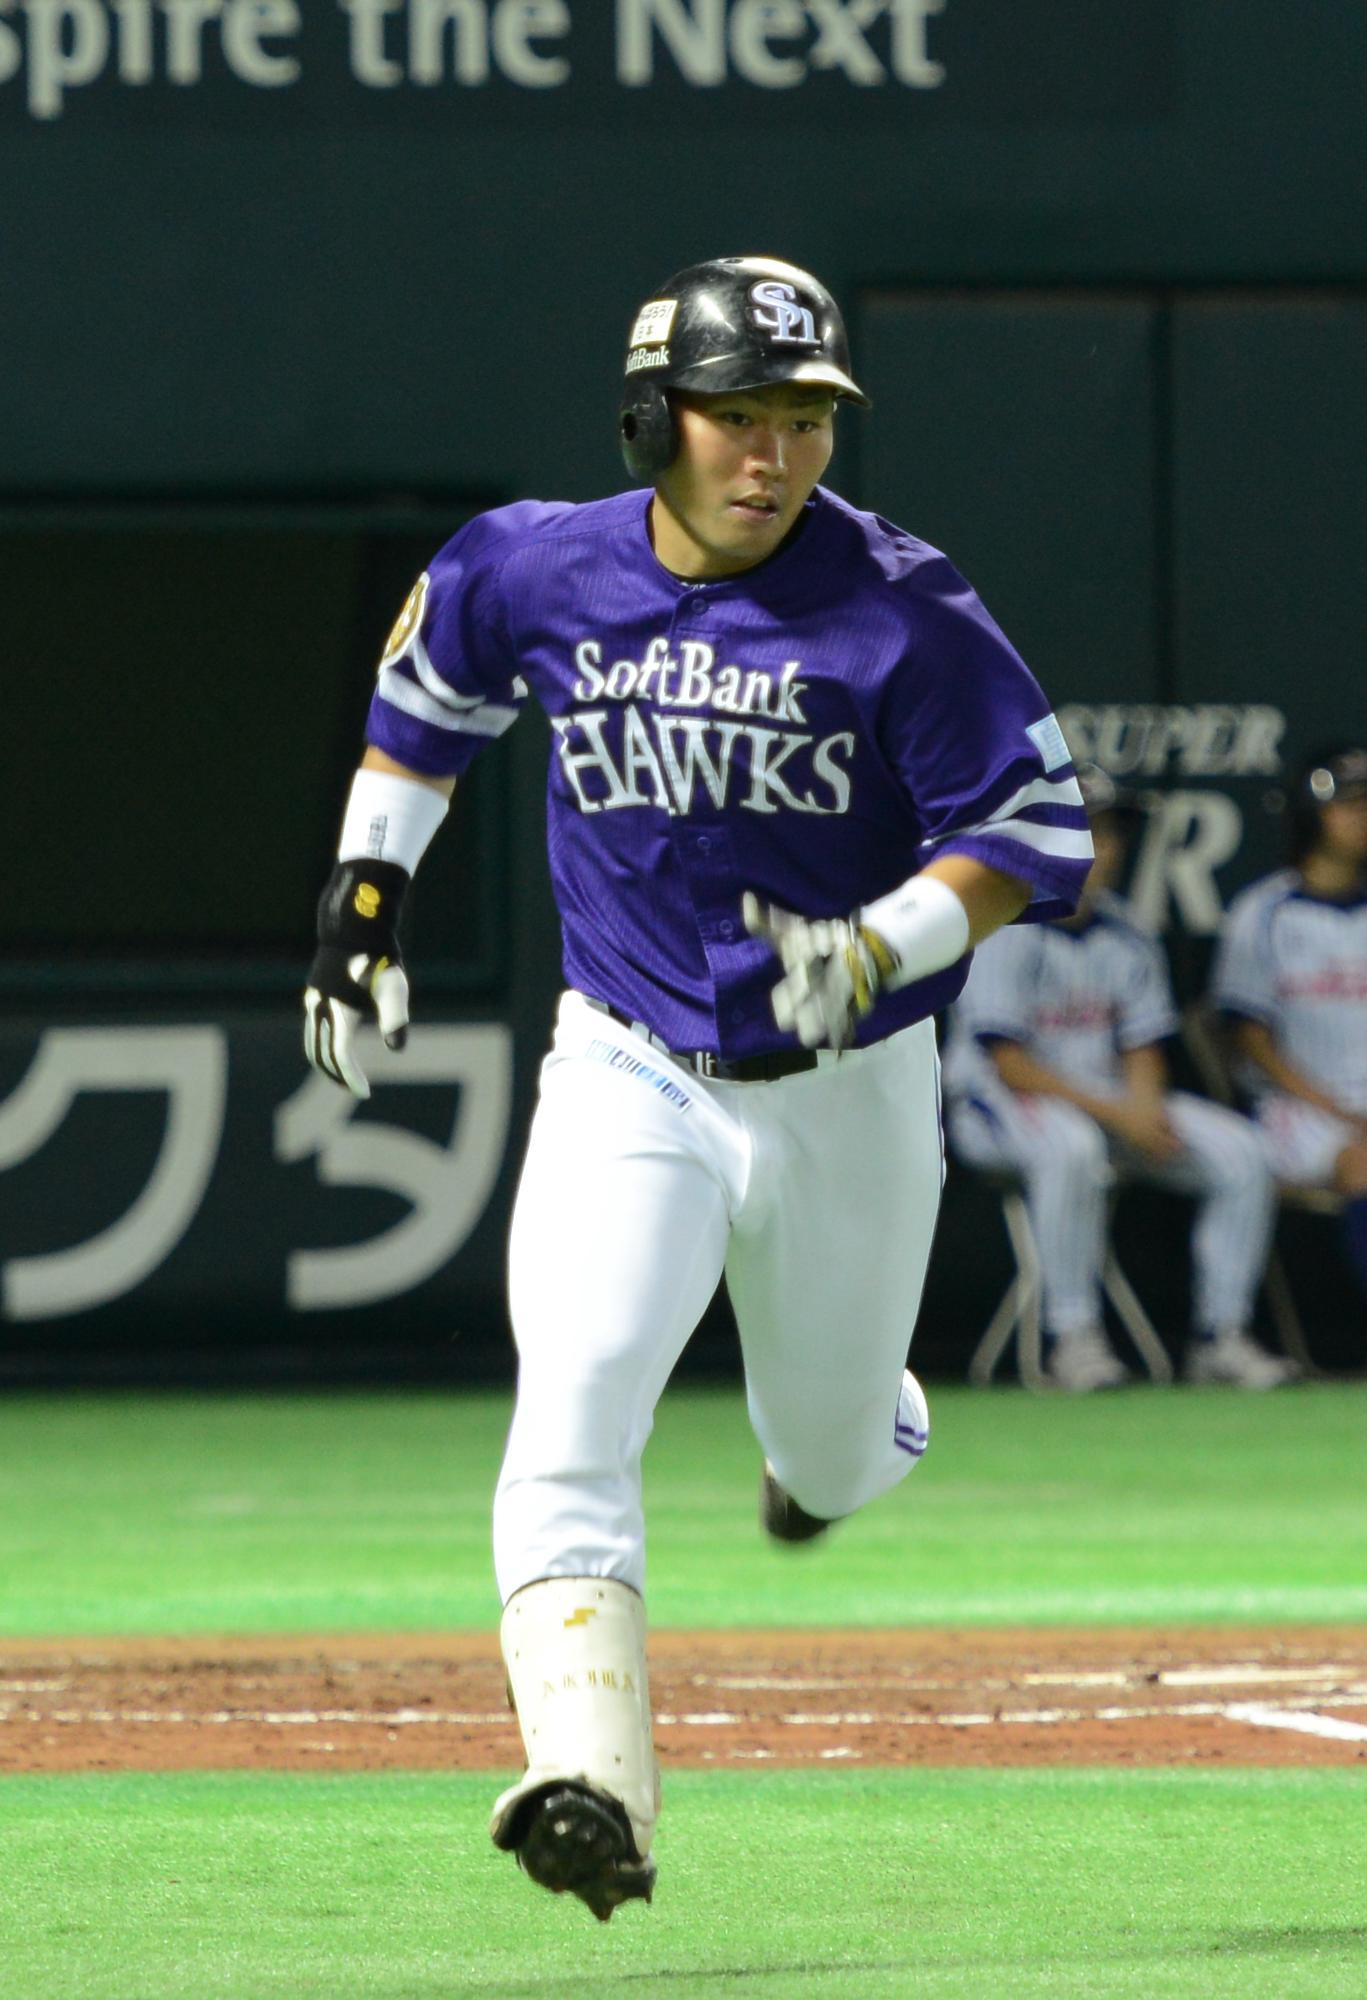 中村晃 (野球) - Wikipedia